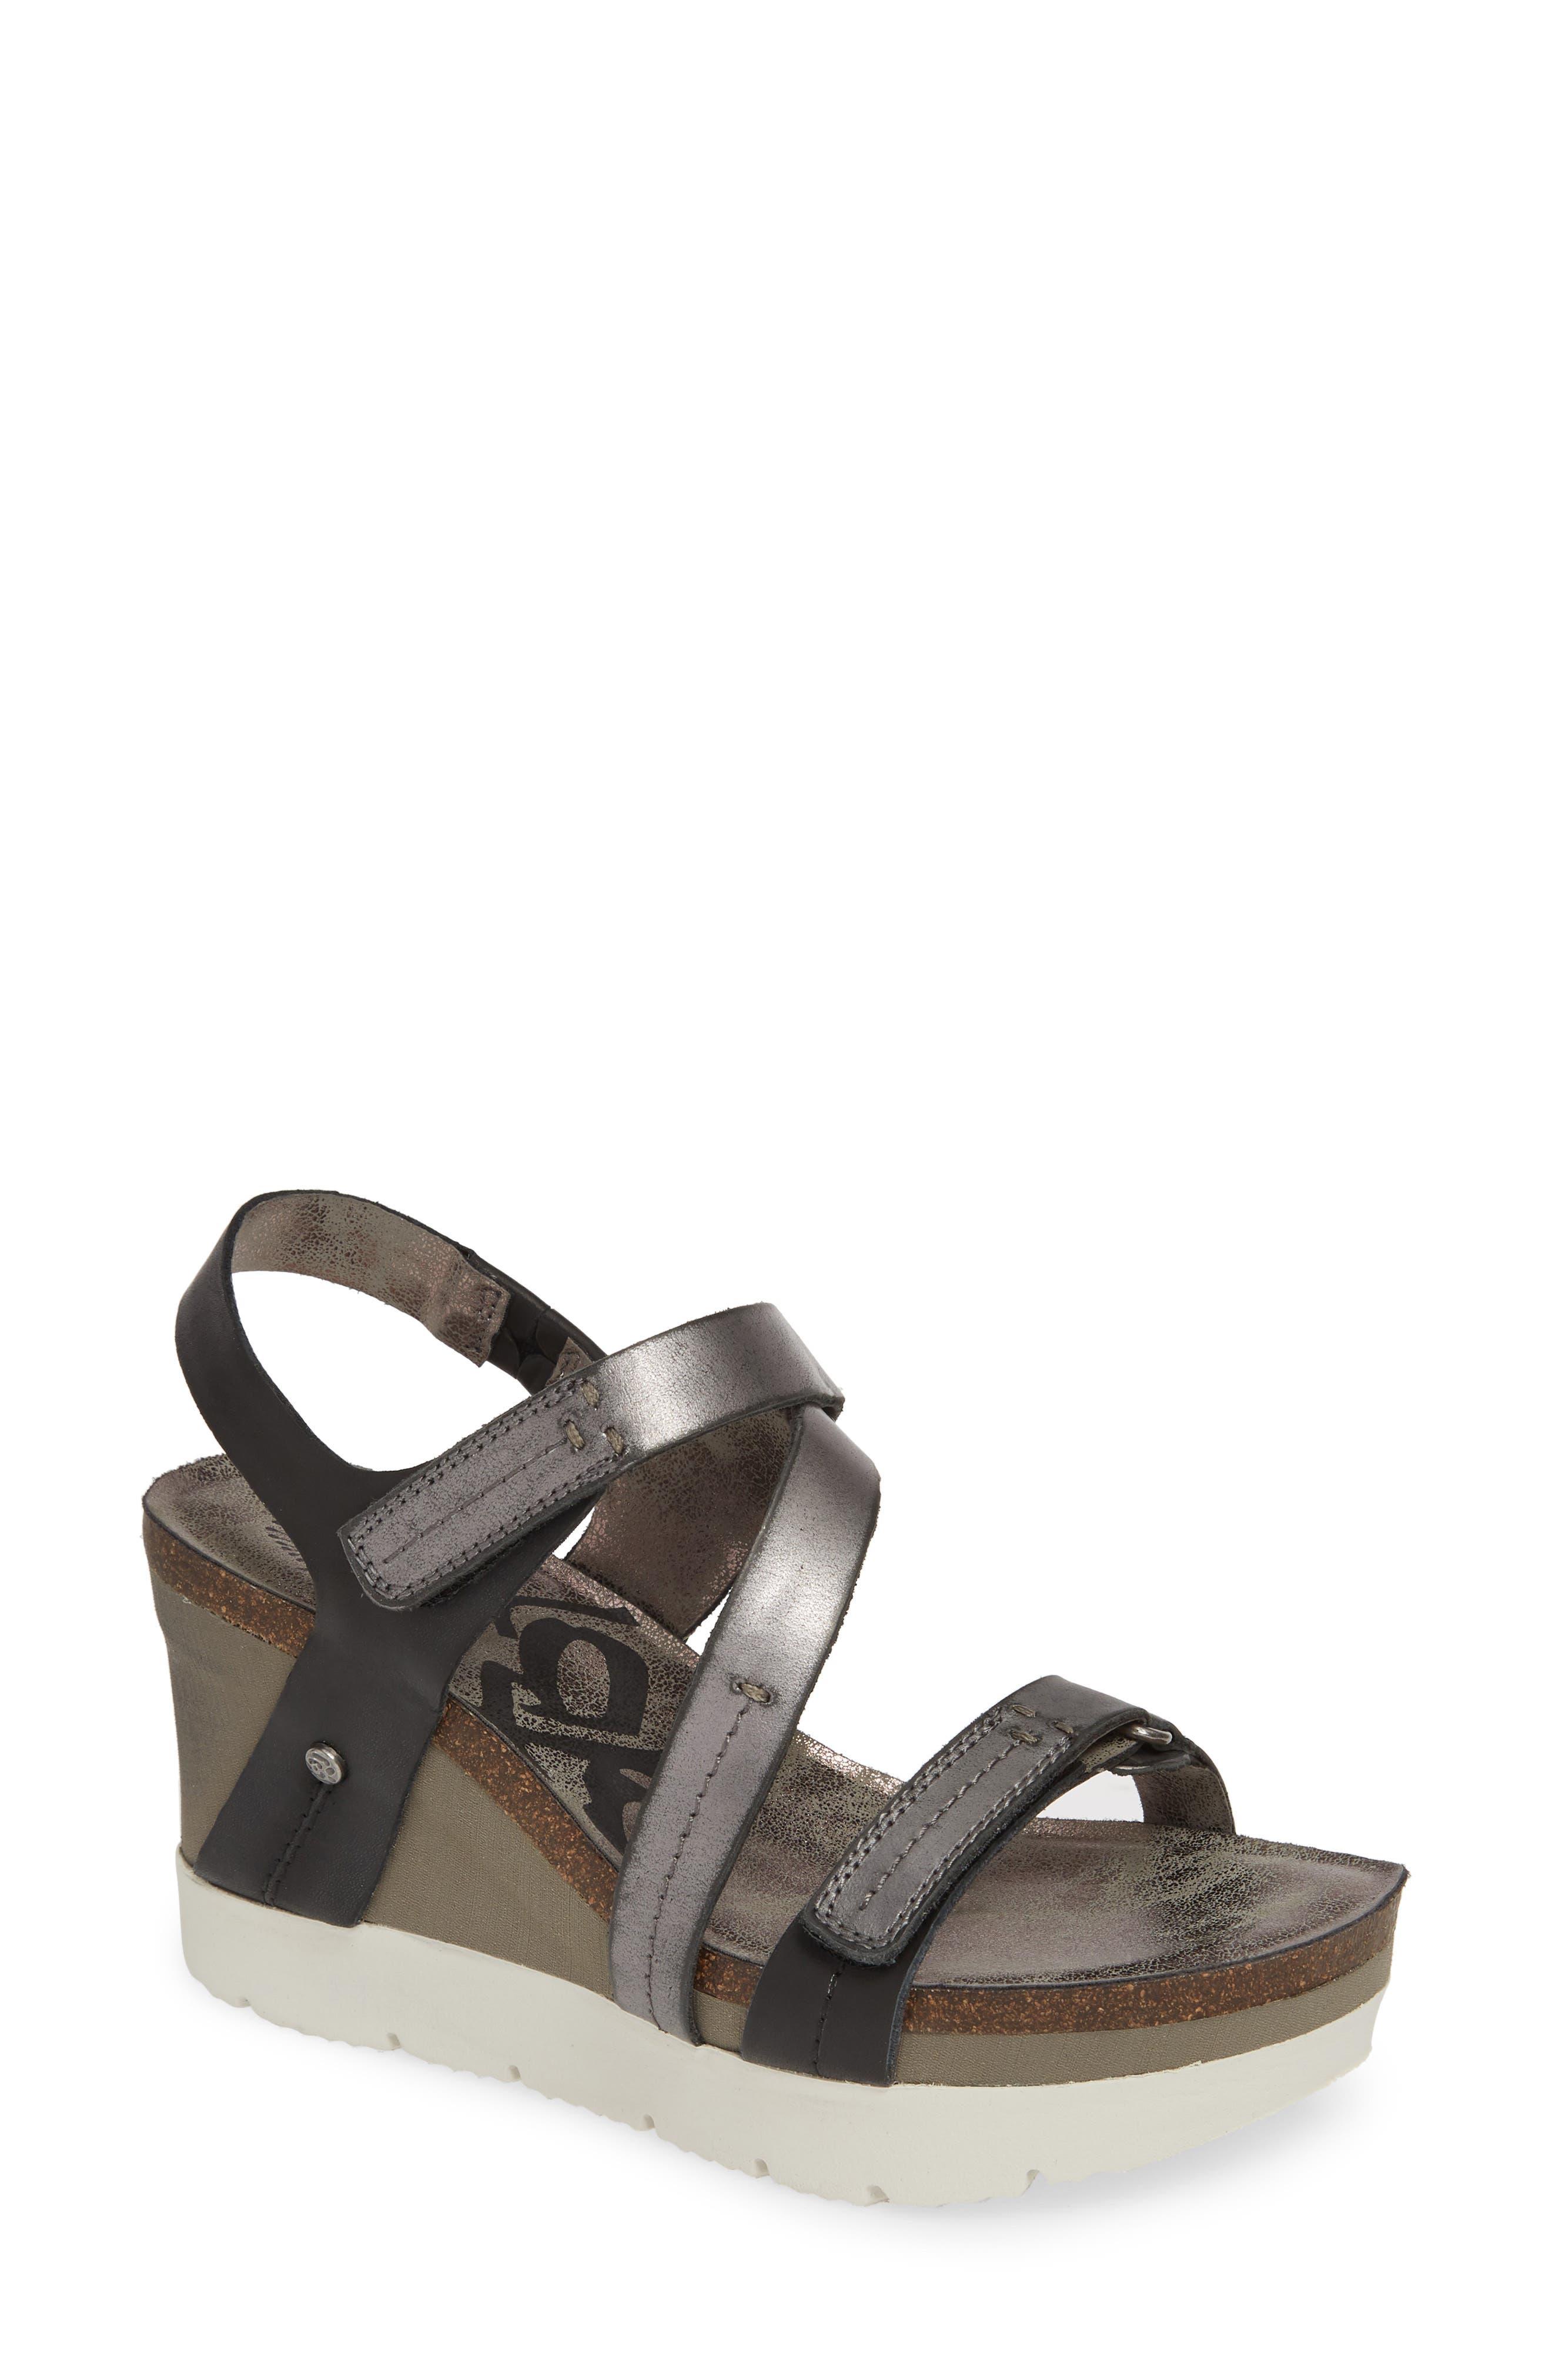 OTBT Wavey Wedge Sandal, Main, color, NEW BLACK LEATHER